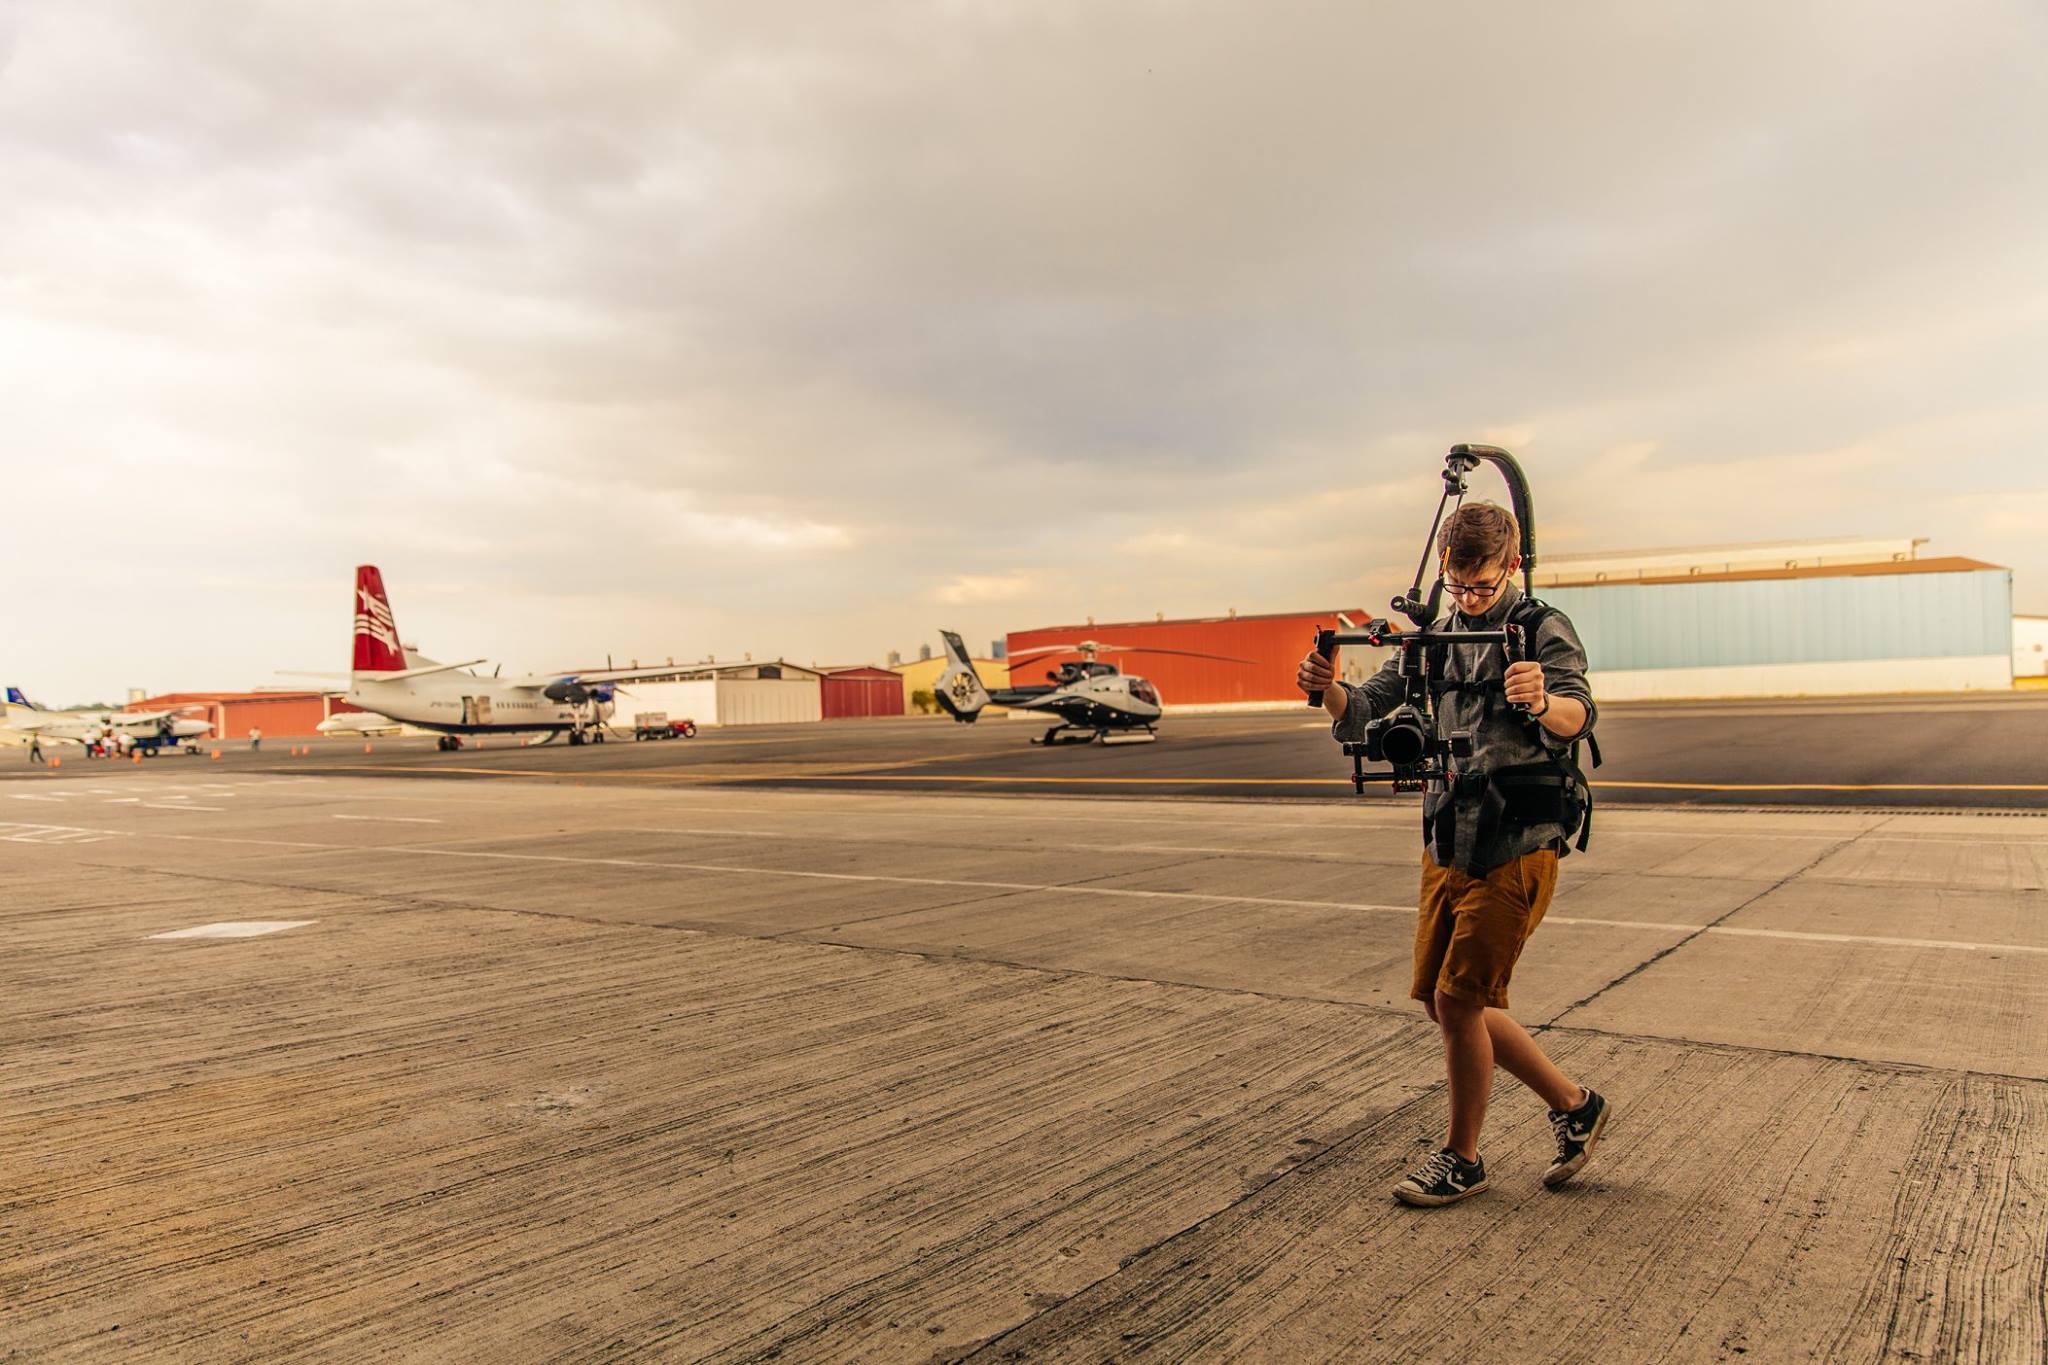 Ronin-M and Easyrig at the Heliport  Photo credit: Yasha Malekzad